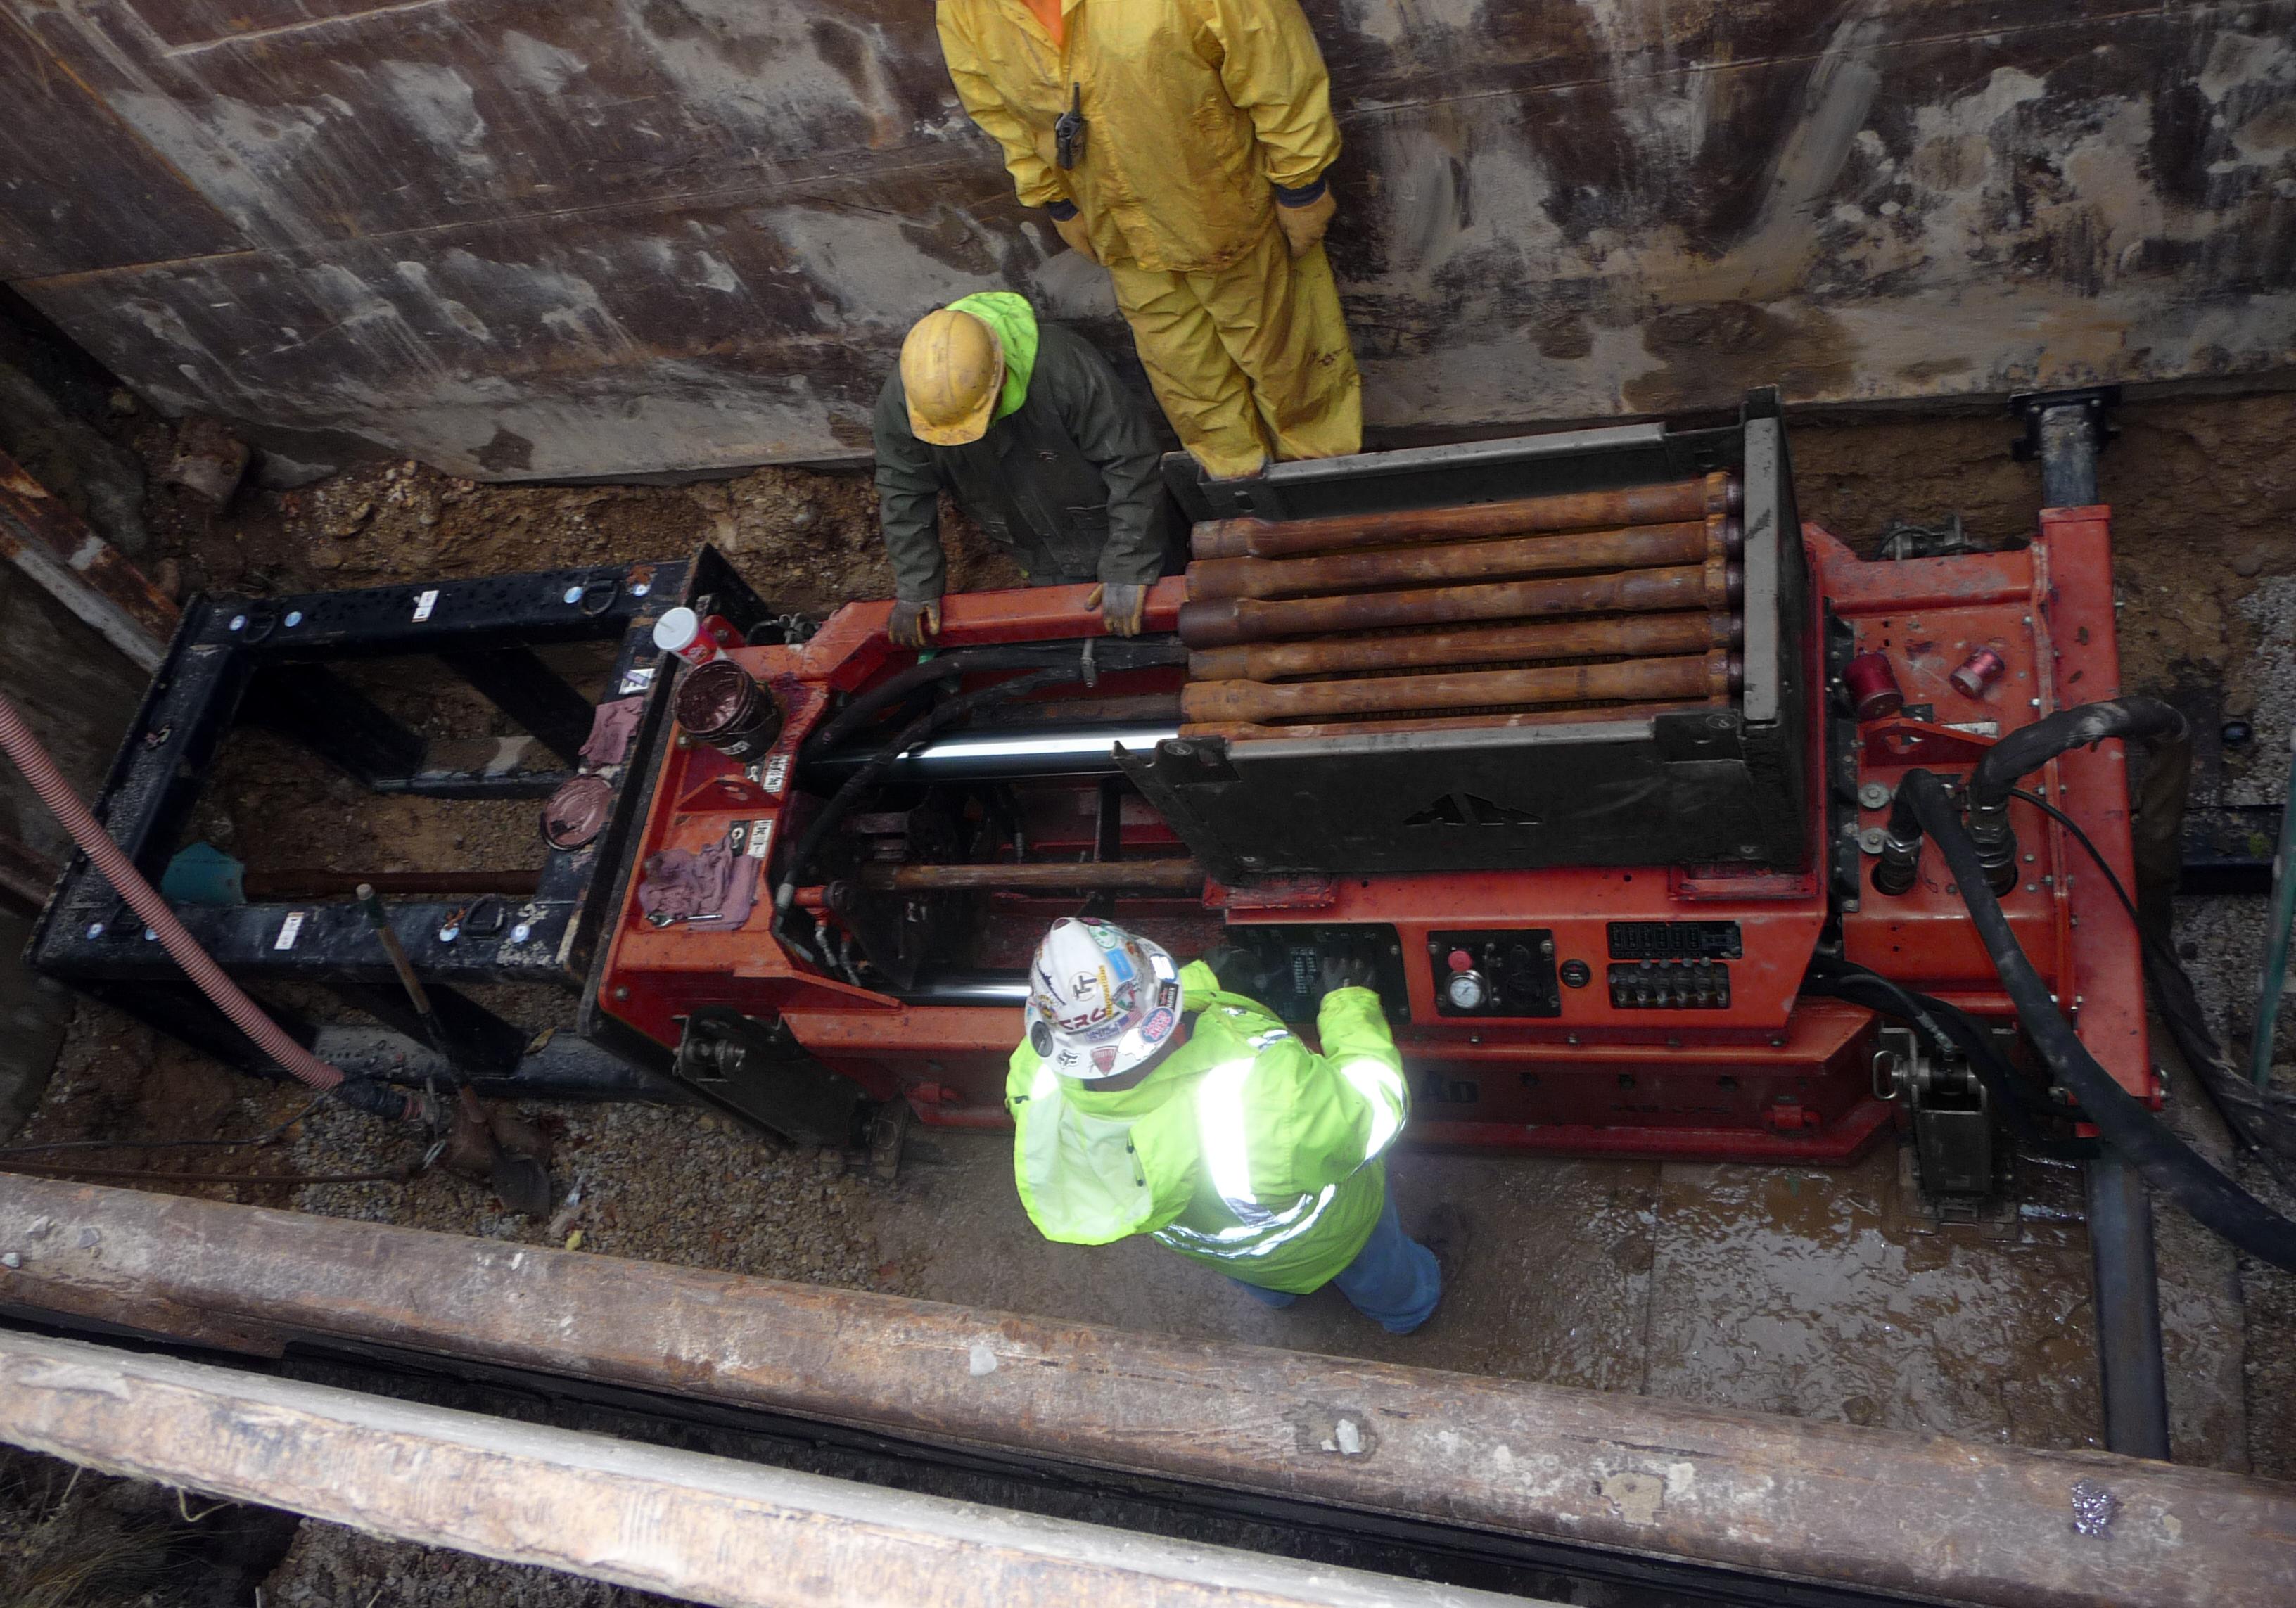 Pipe bursting solves environmental issues underground